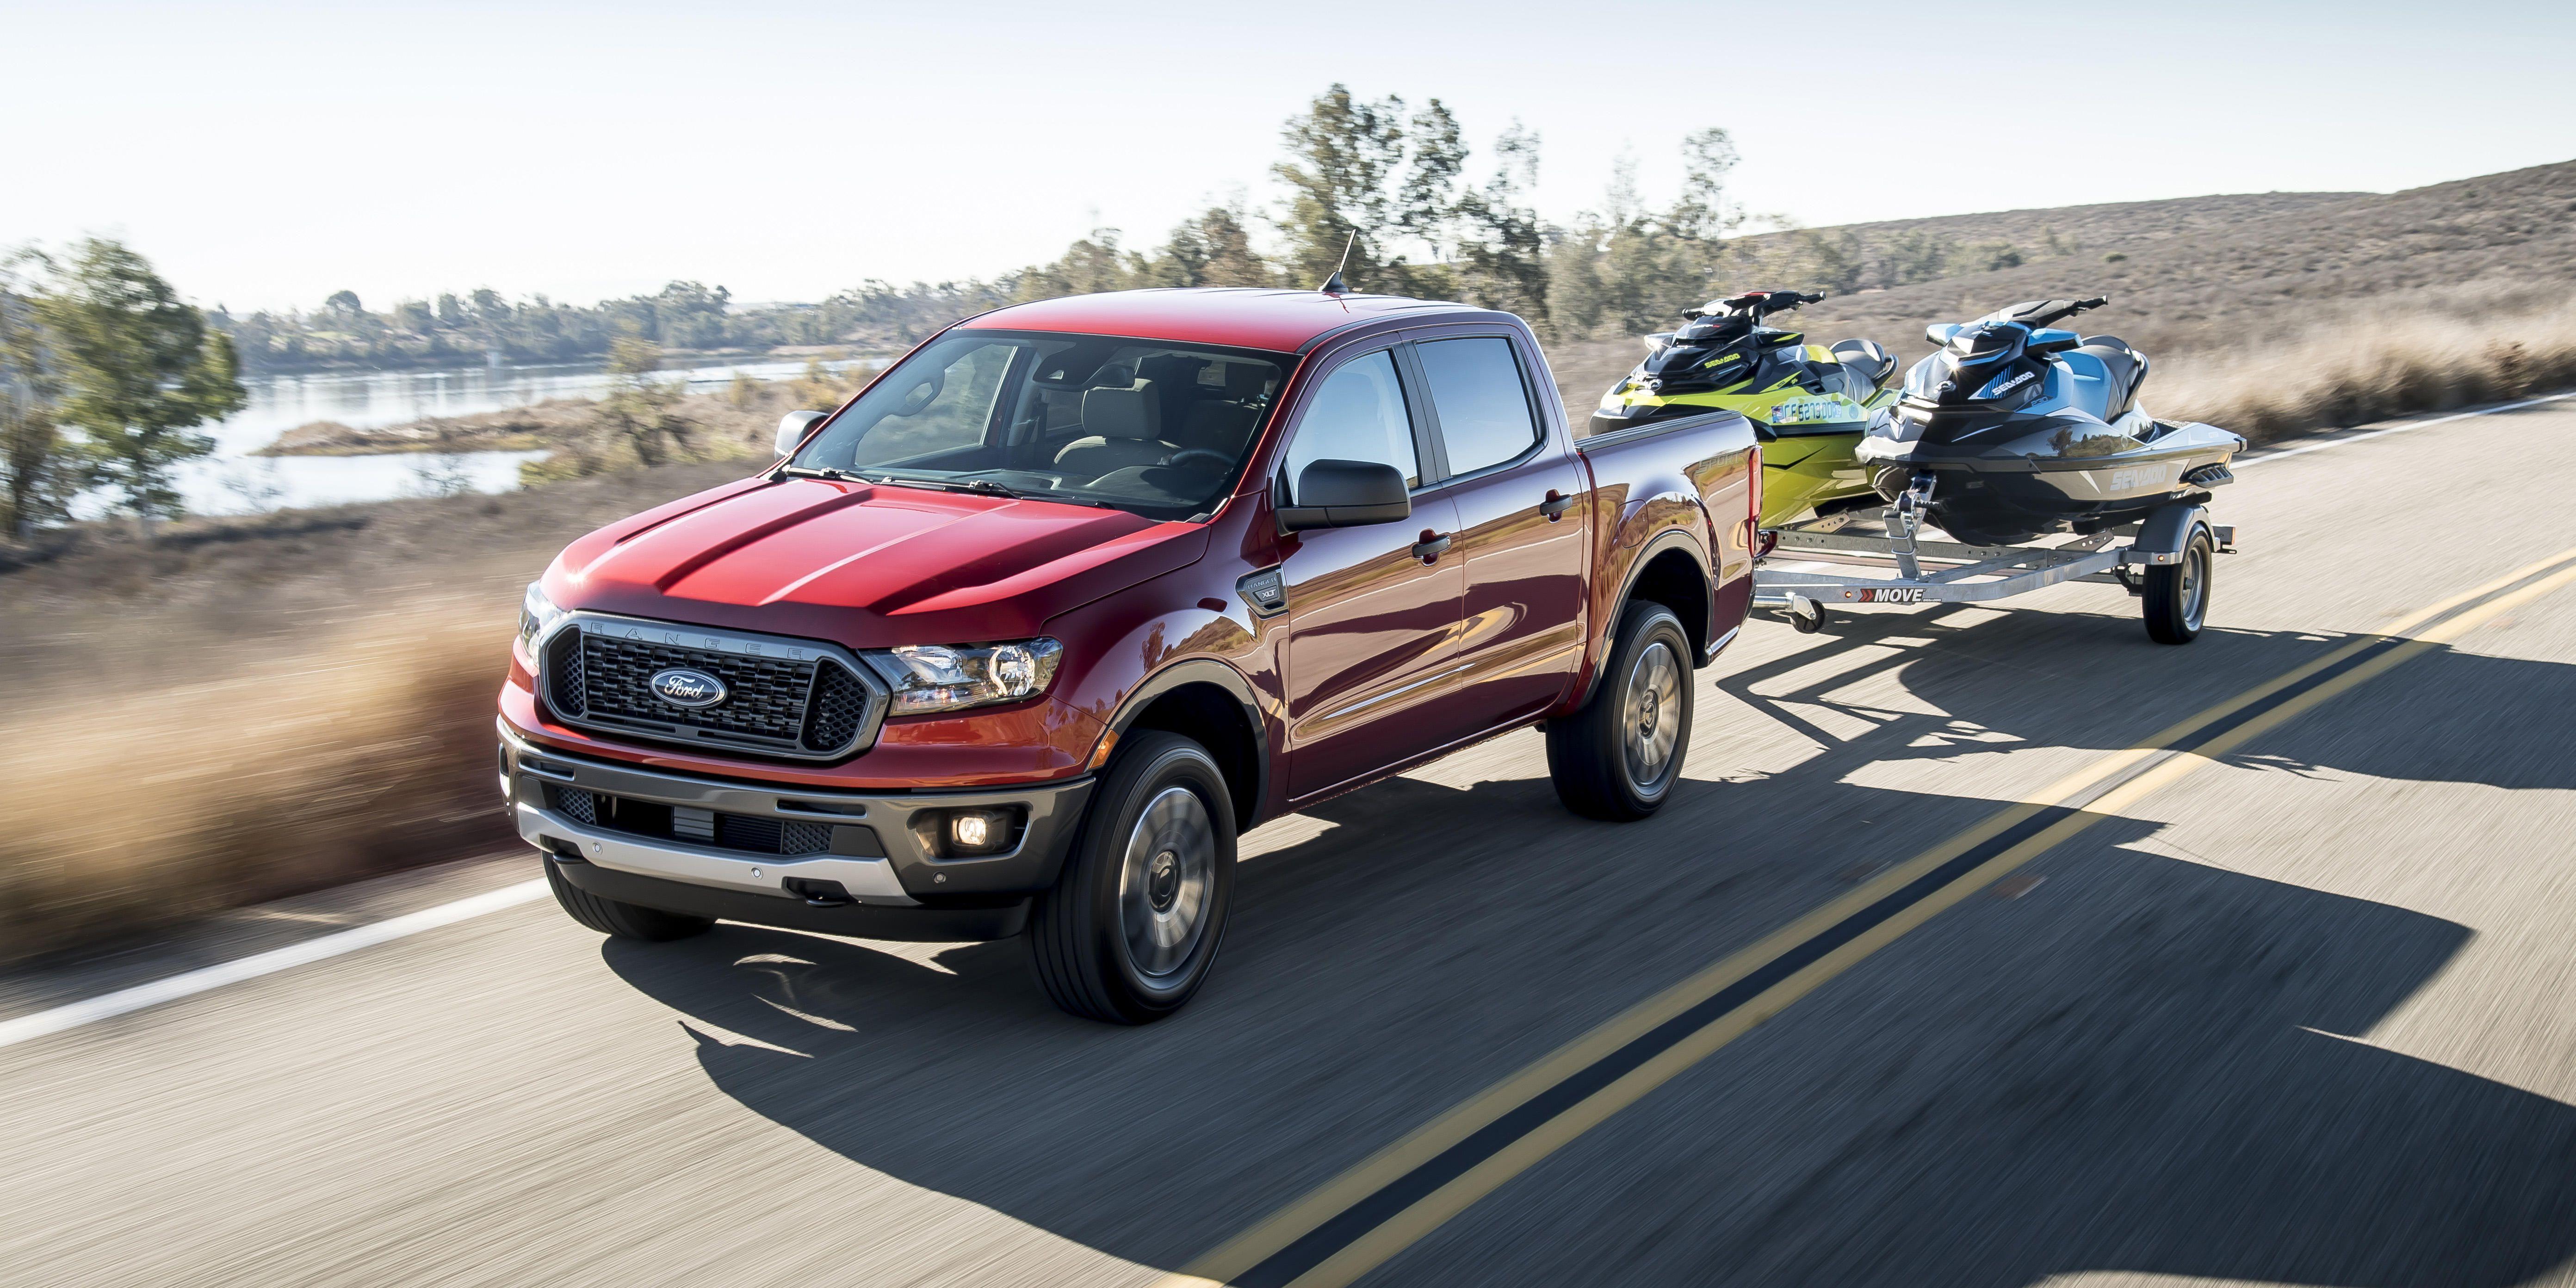 2019 Ford Ranger Review A Midsize Truck Champ 2019 Ford Ranger